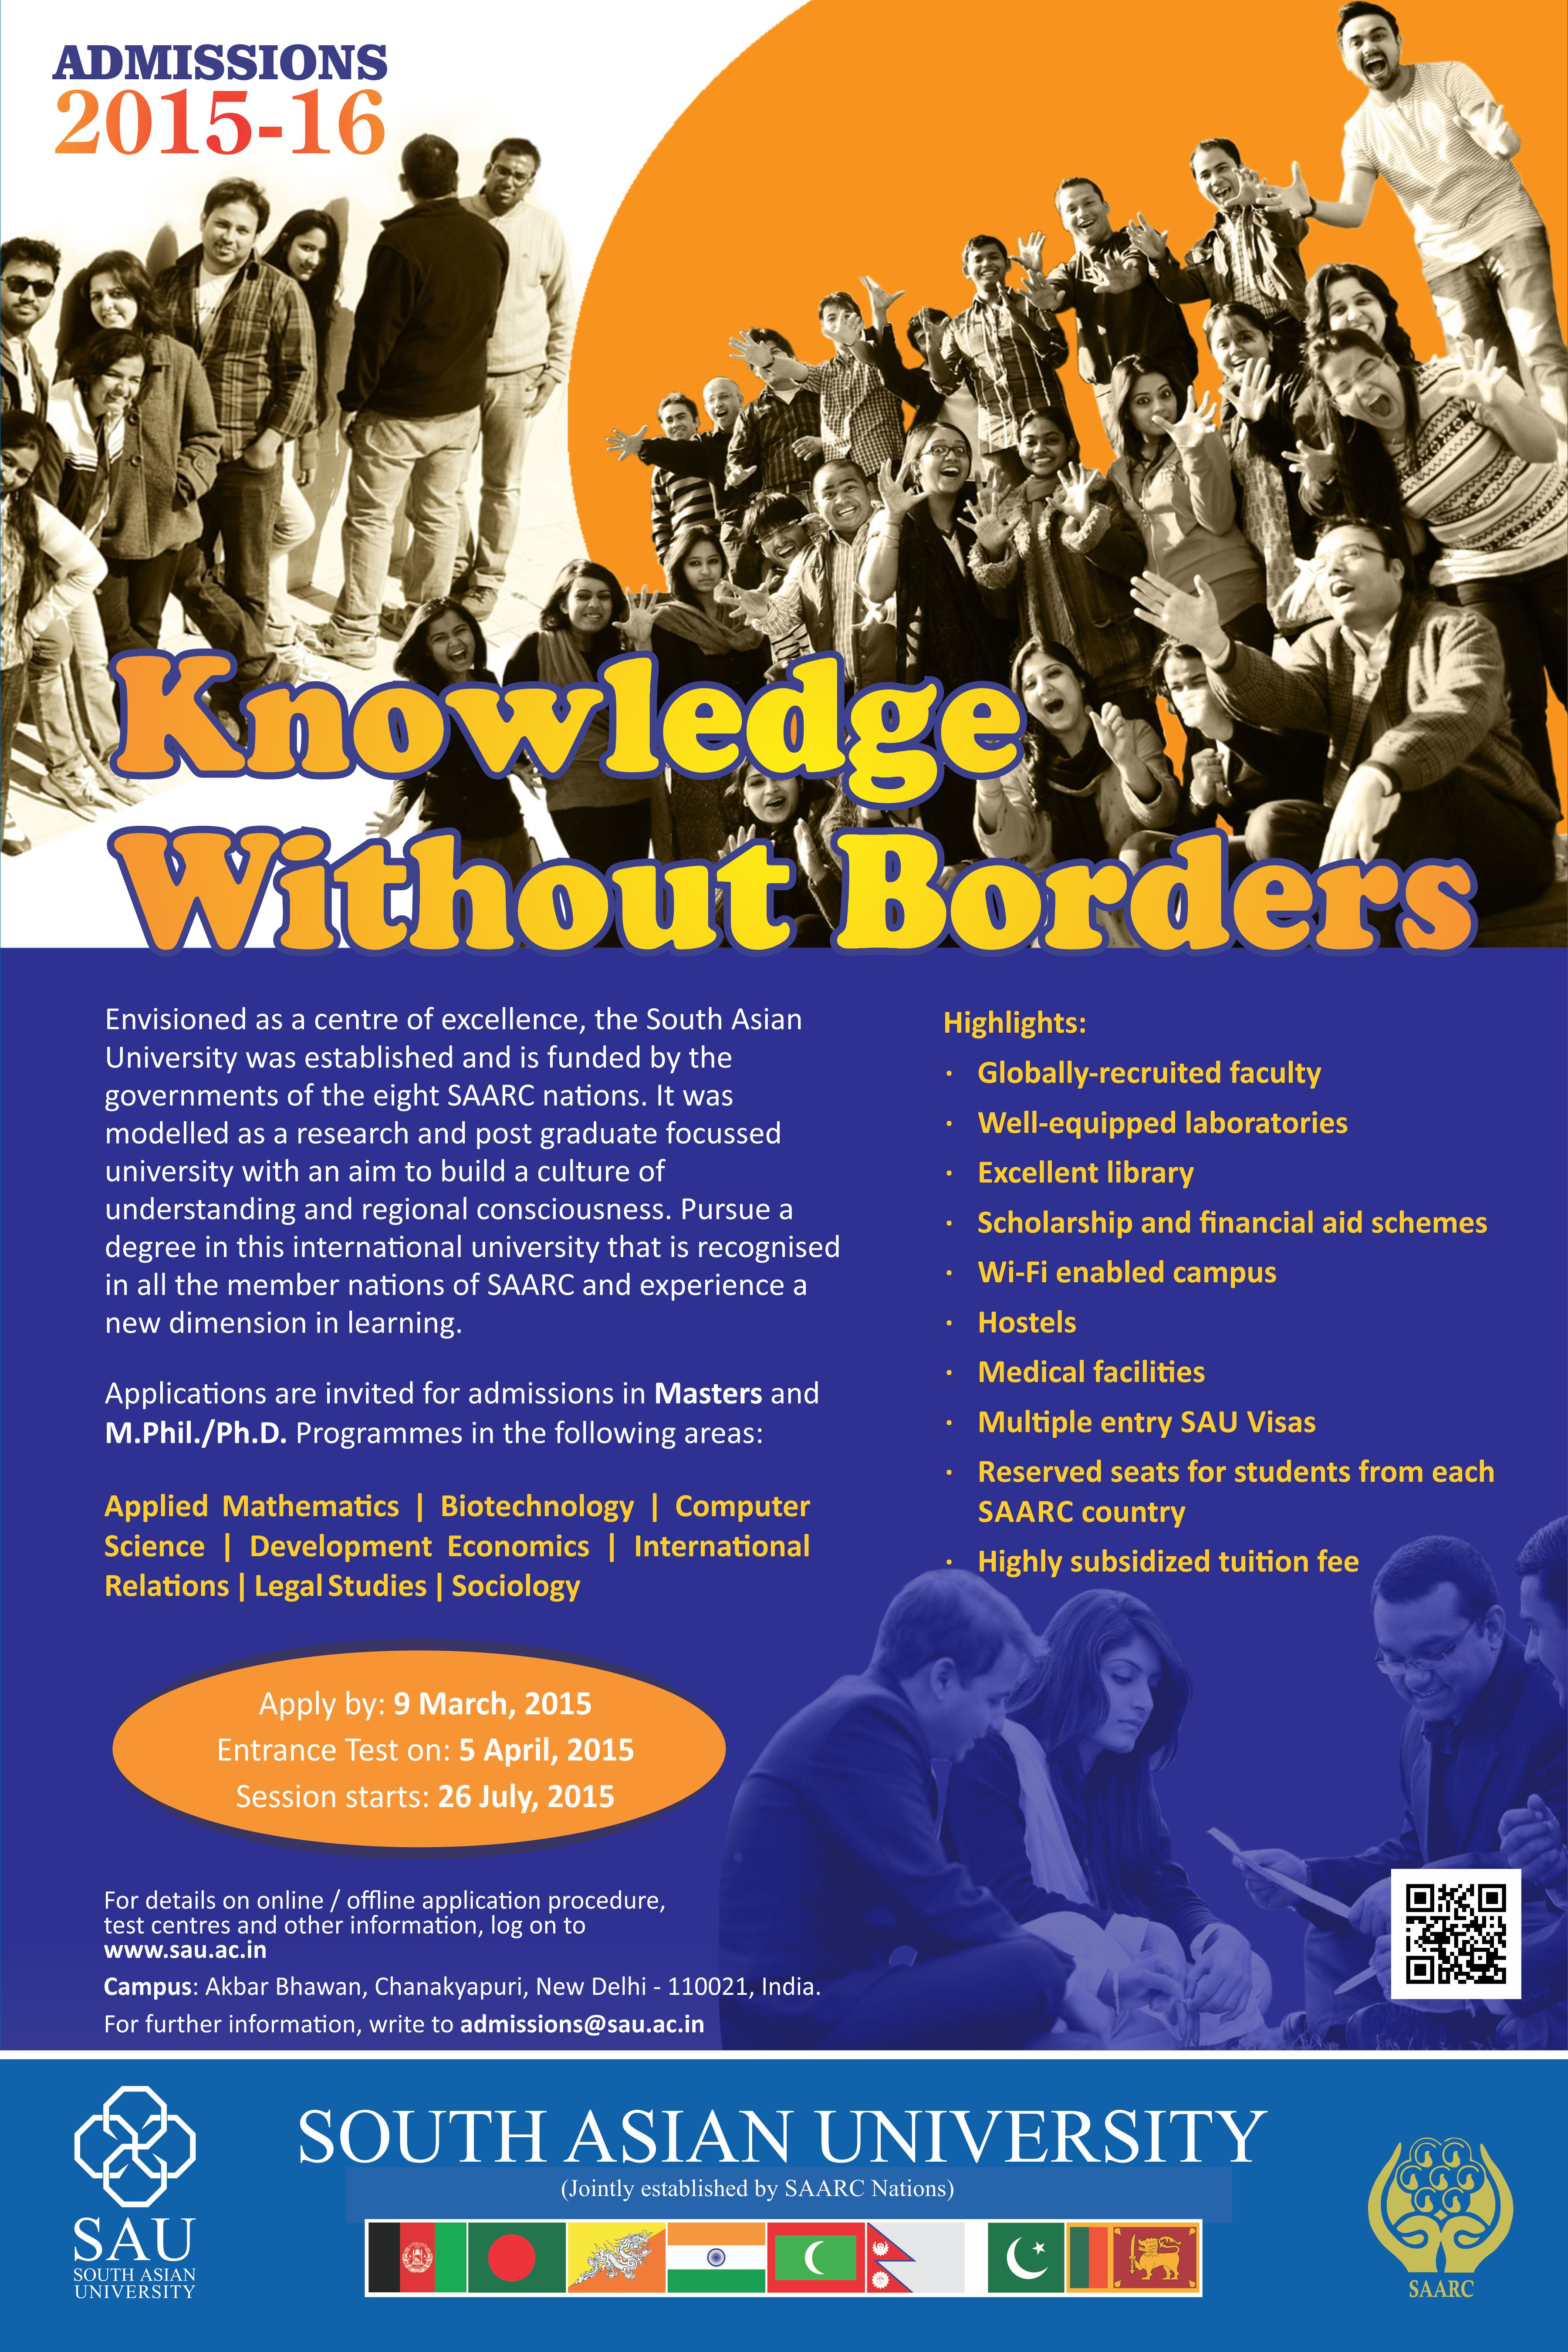 SAU Admission Poster 2015-16